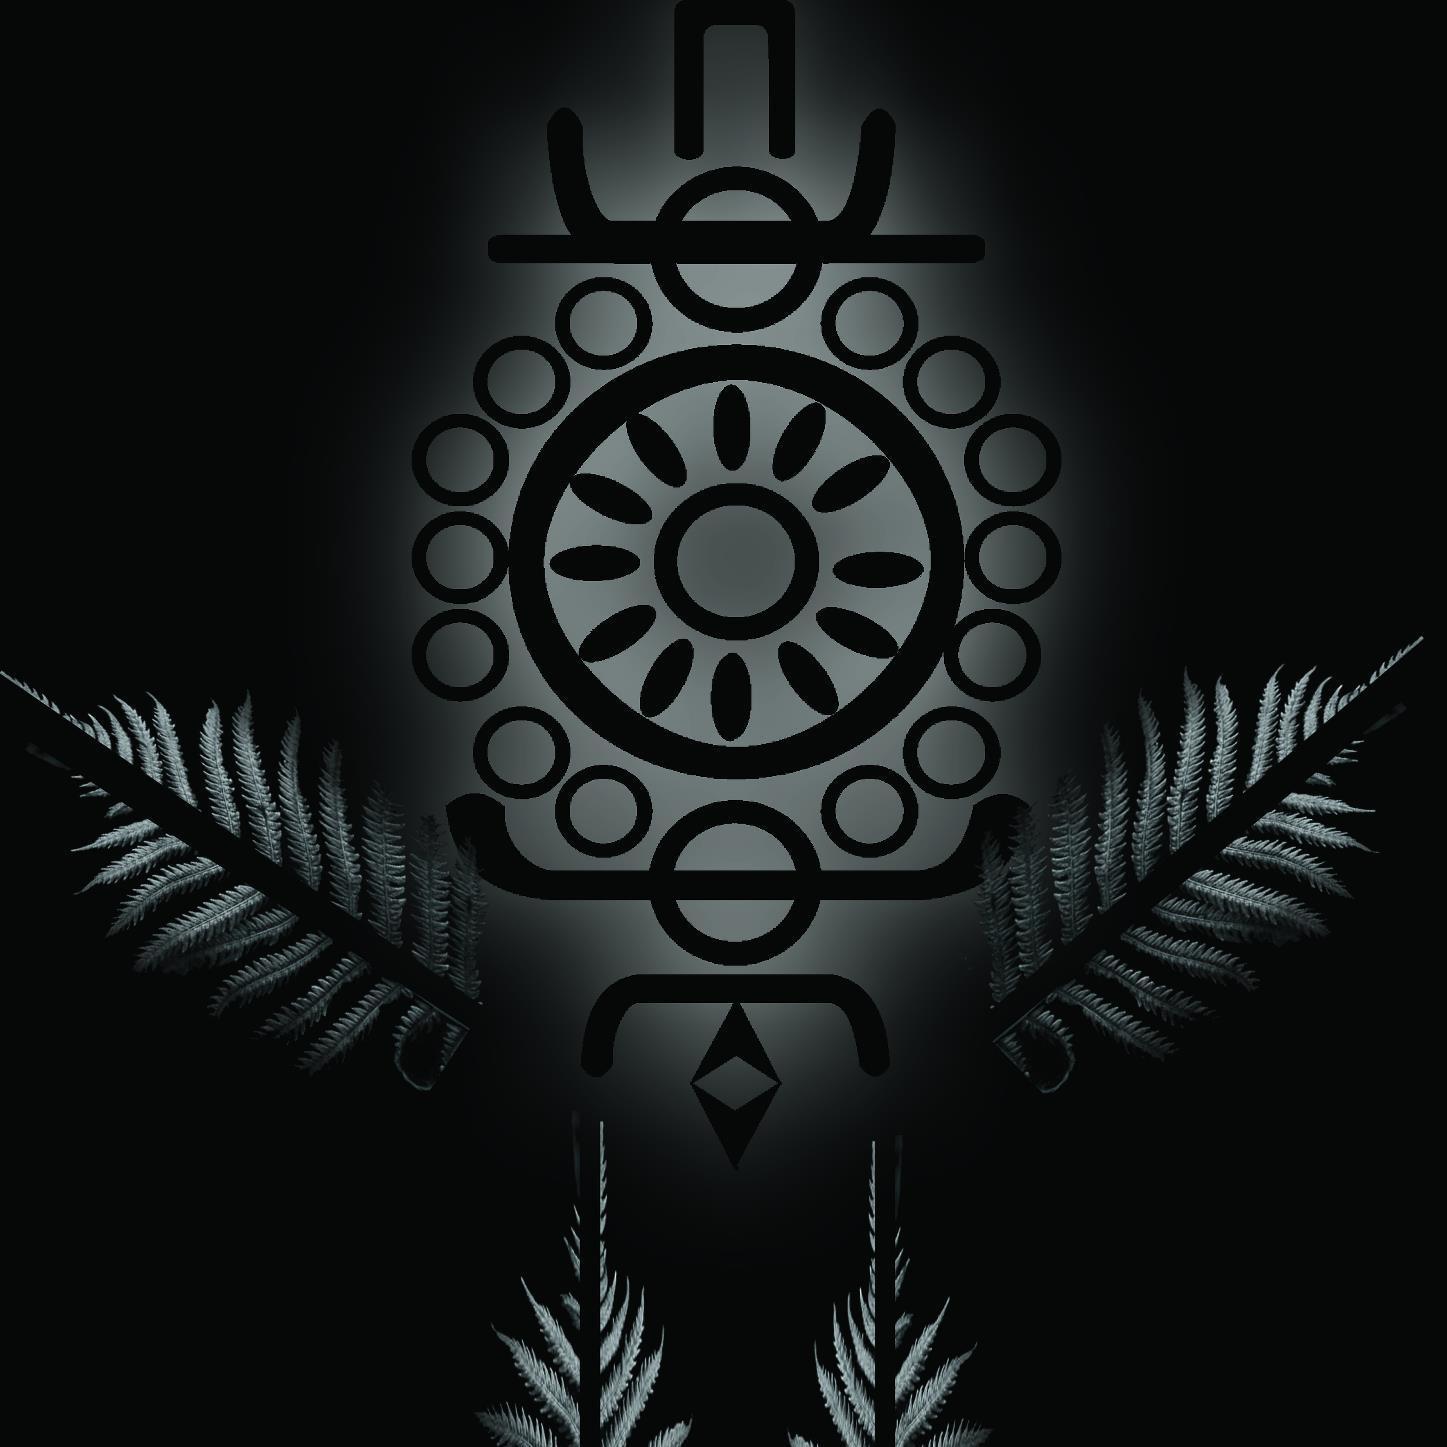 Ashaena symbol